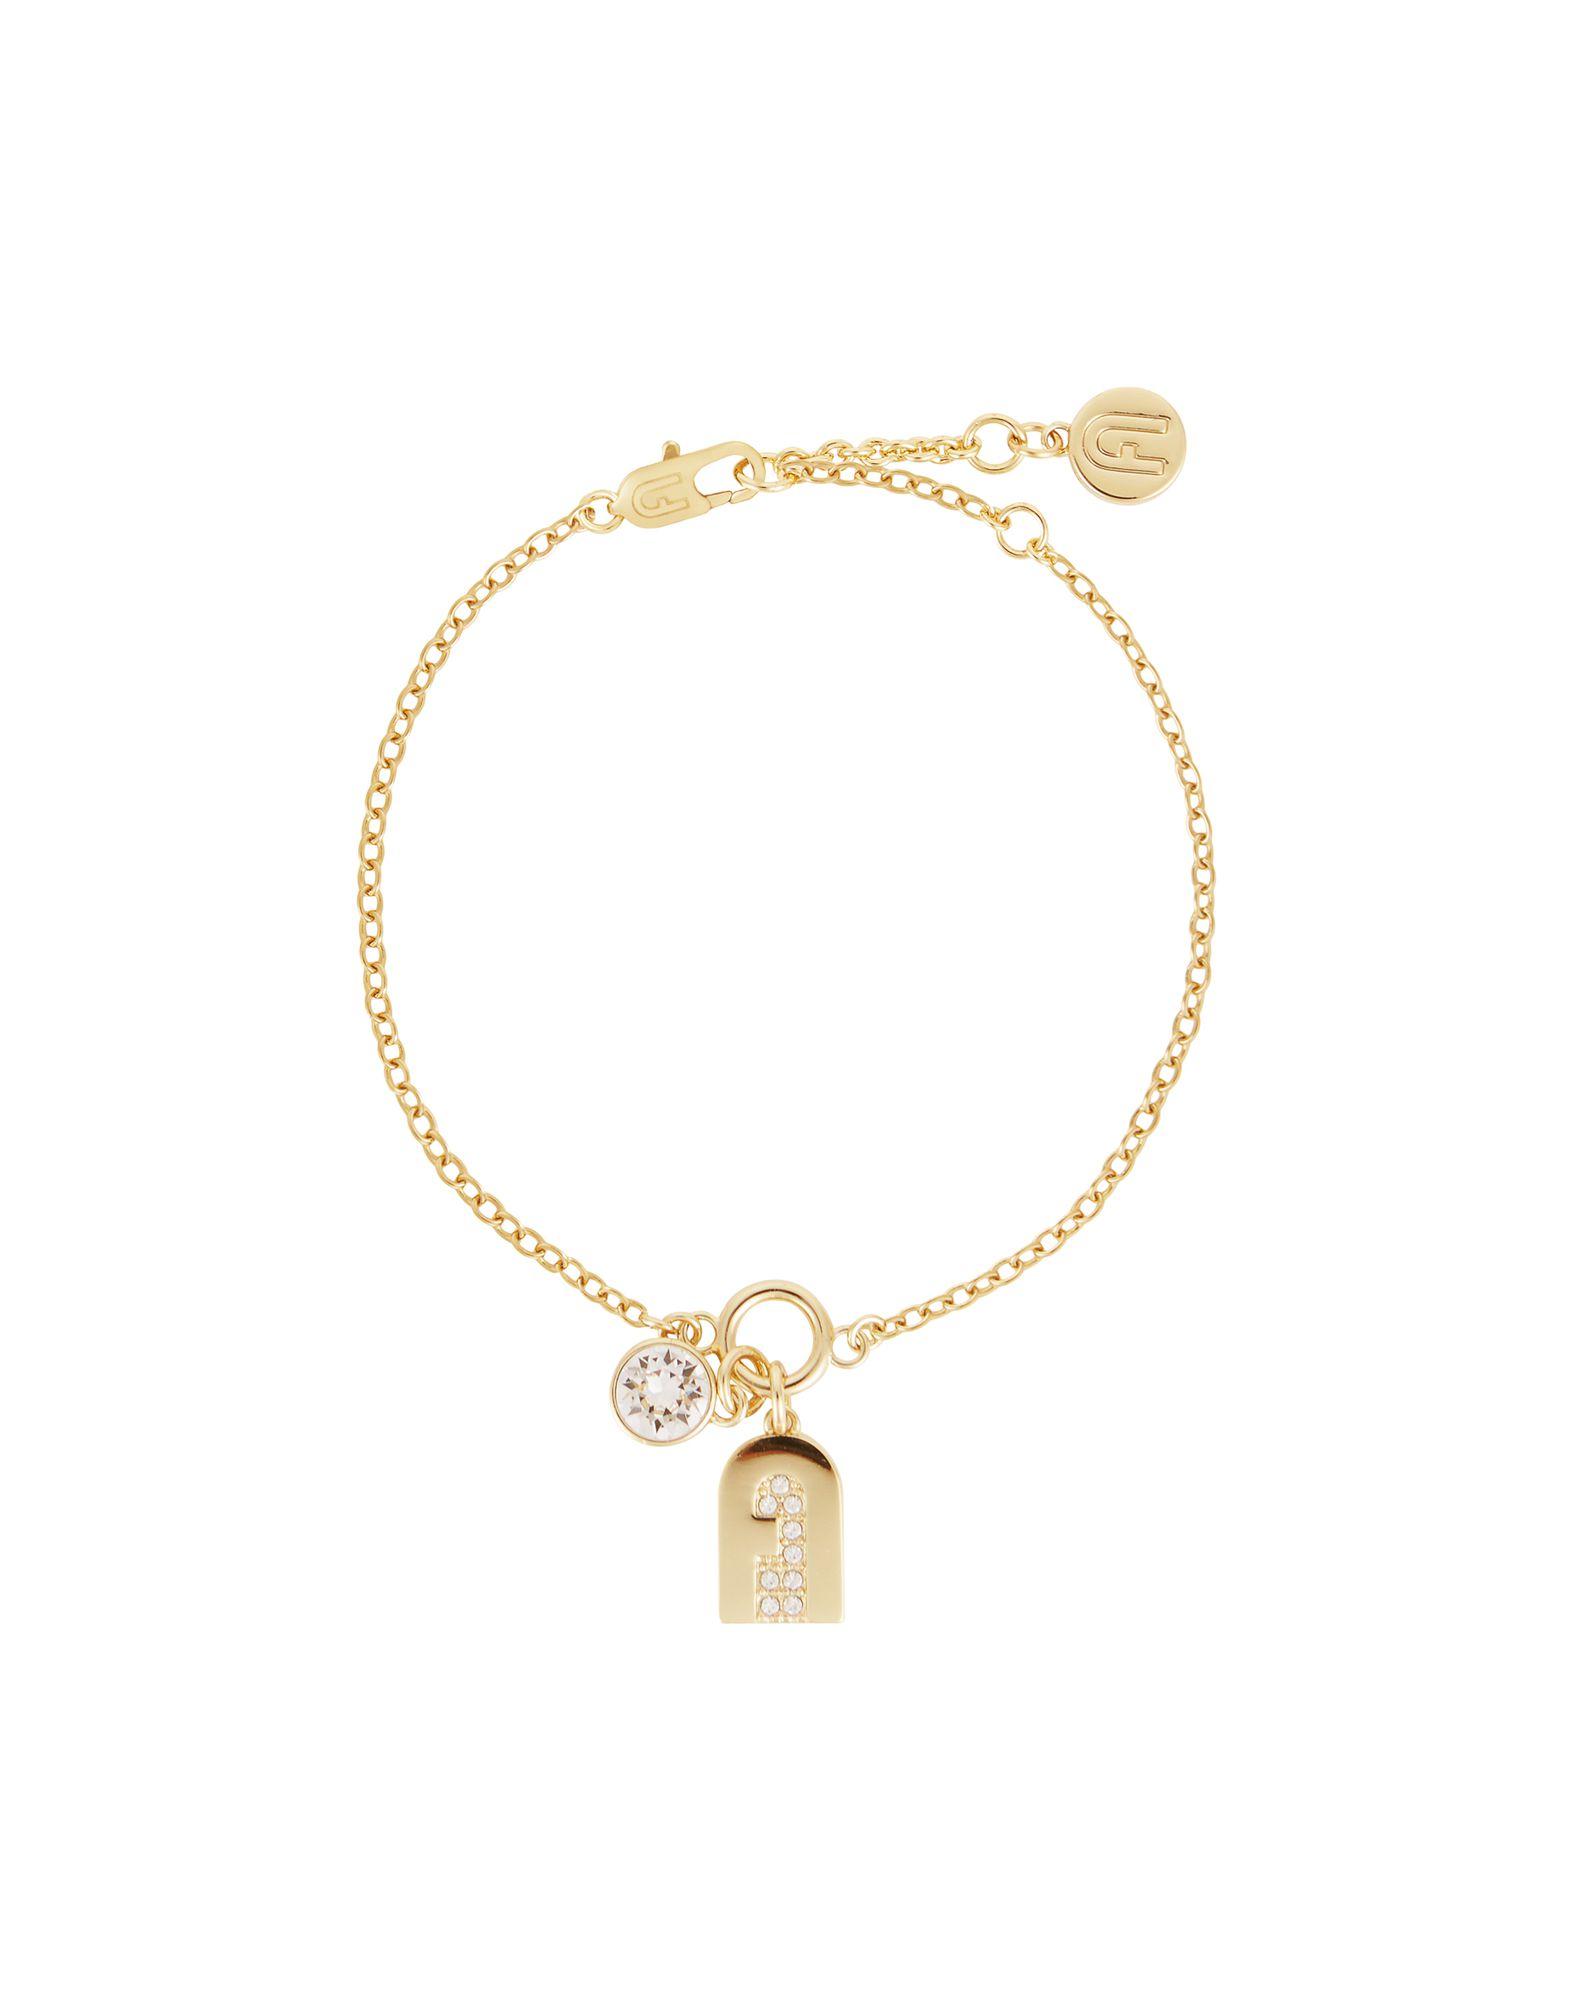 FURLA Bracelets. rhinestones, logo, adjustable hook and chain fastening. 90% Metal, 10% Swarovski crystal